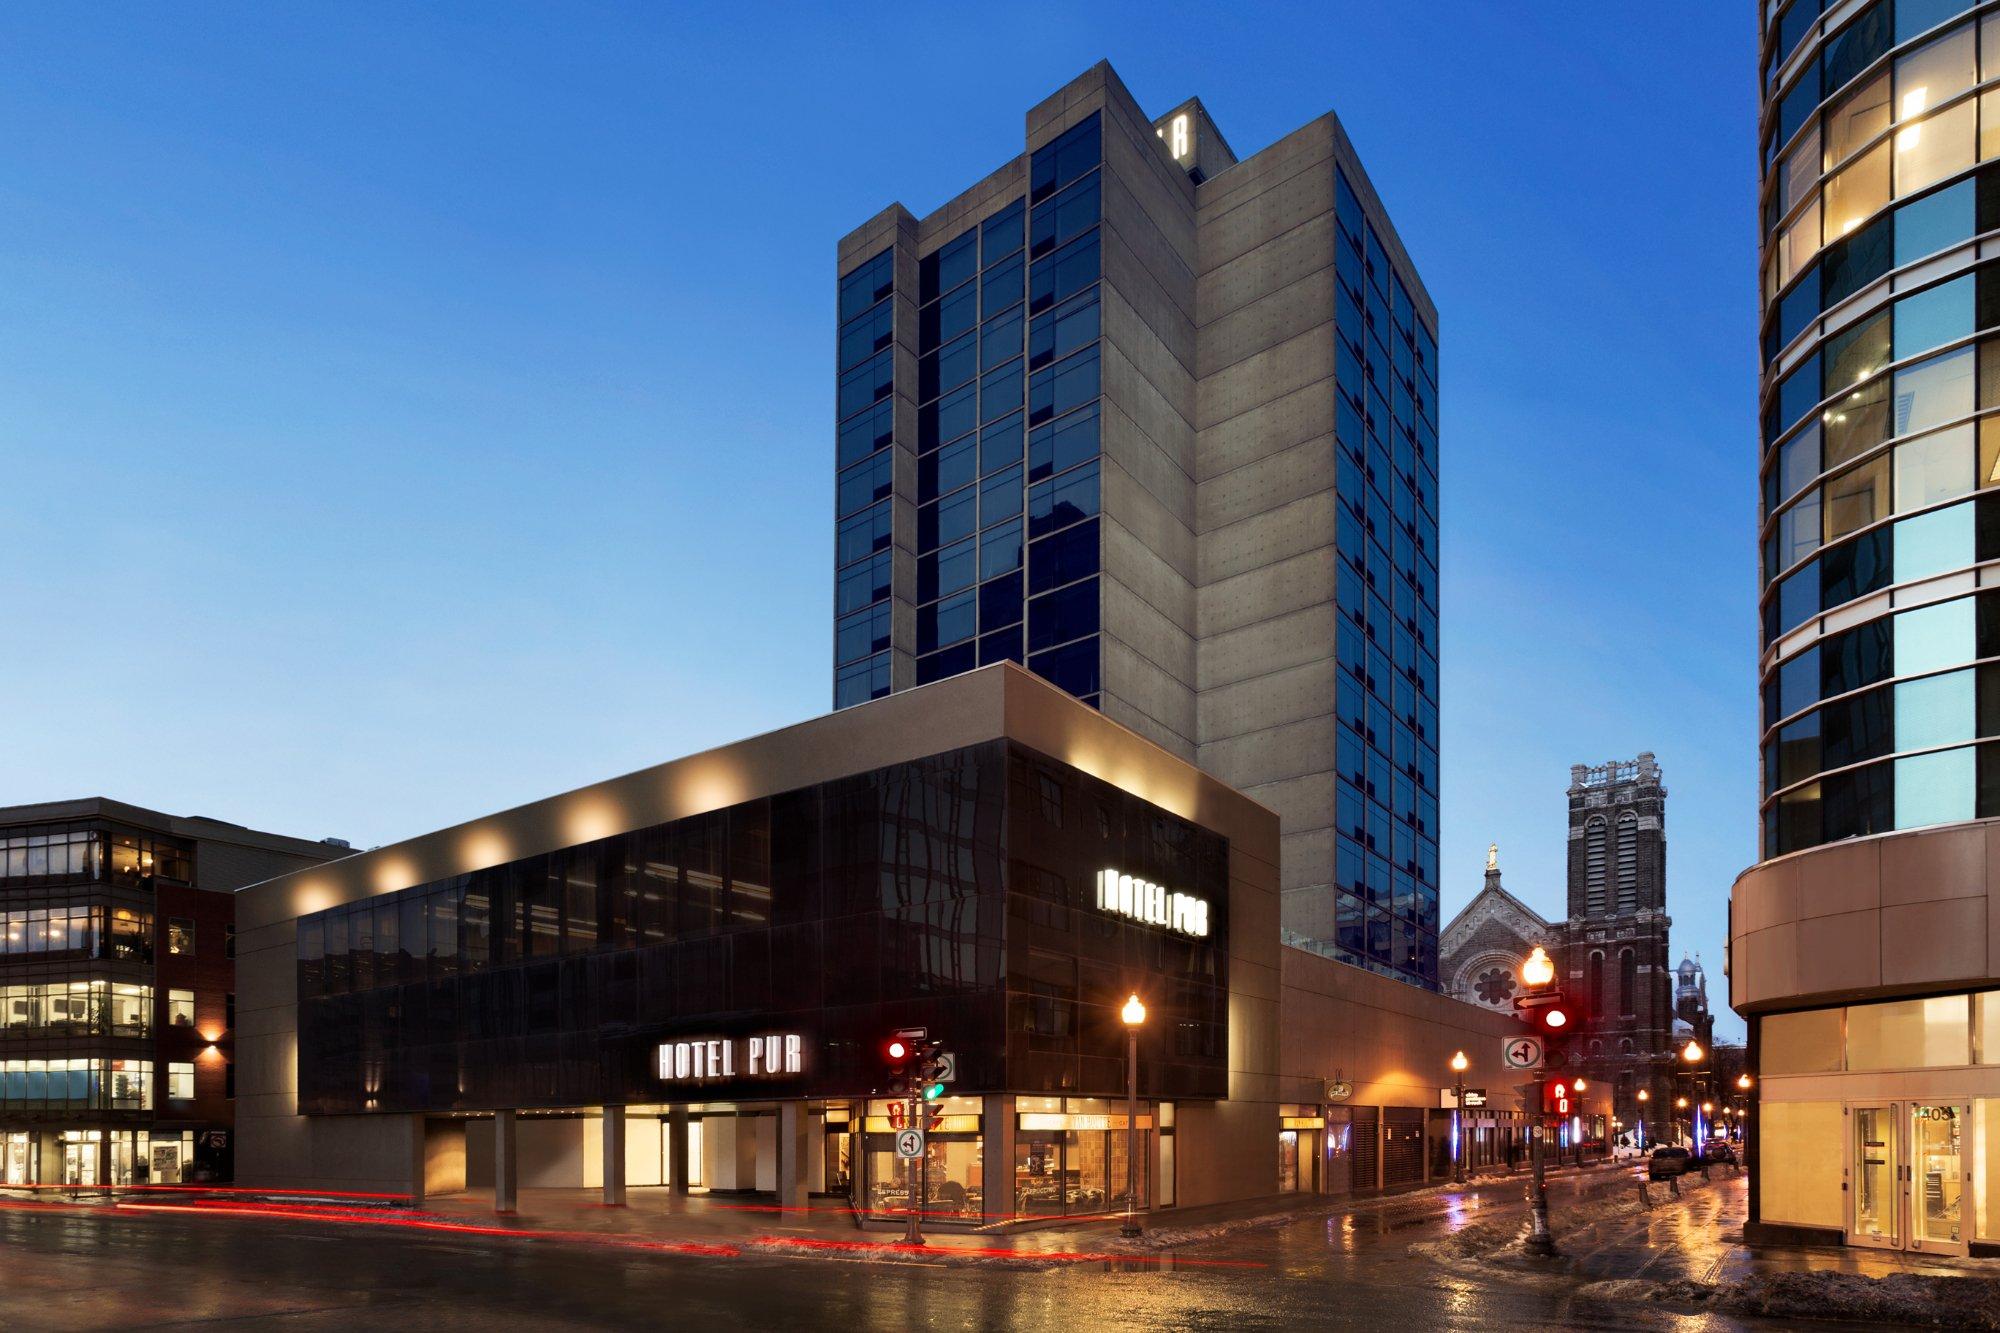 TRYP PUR魁北克酒店